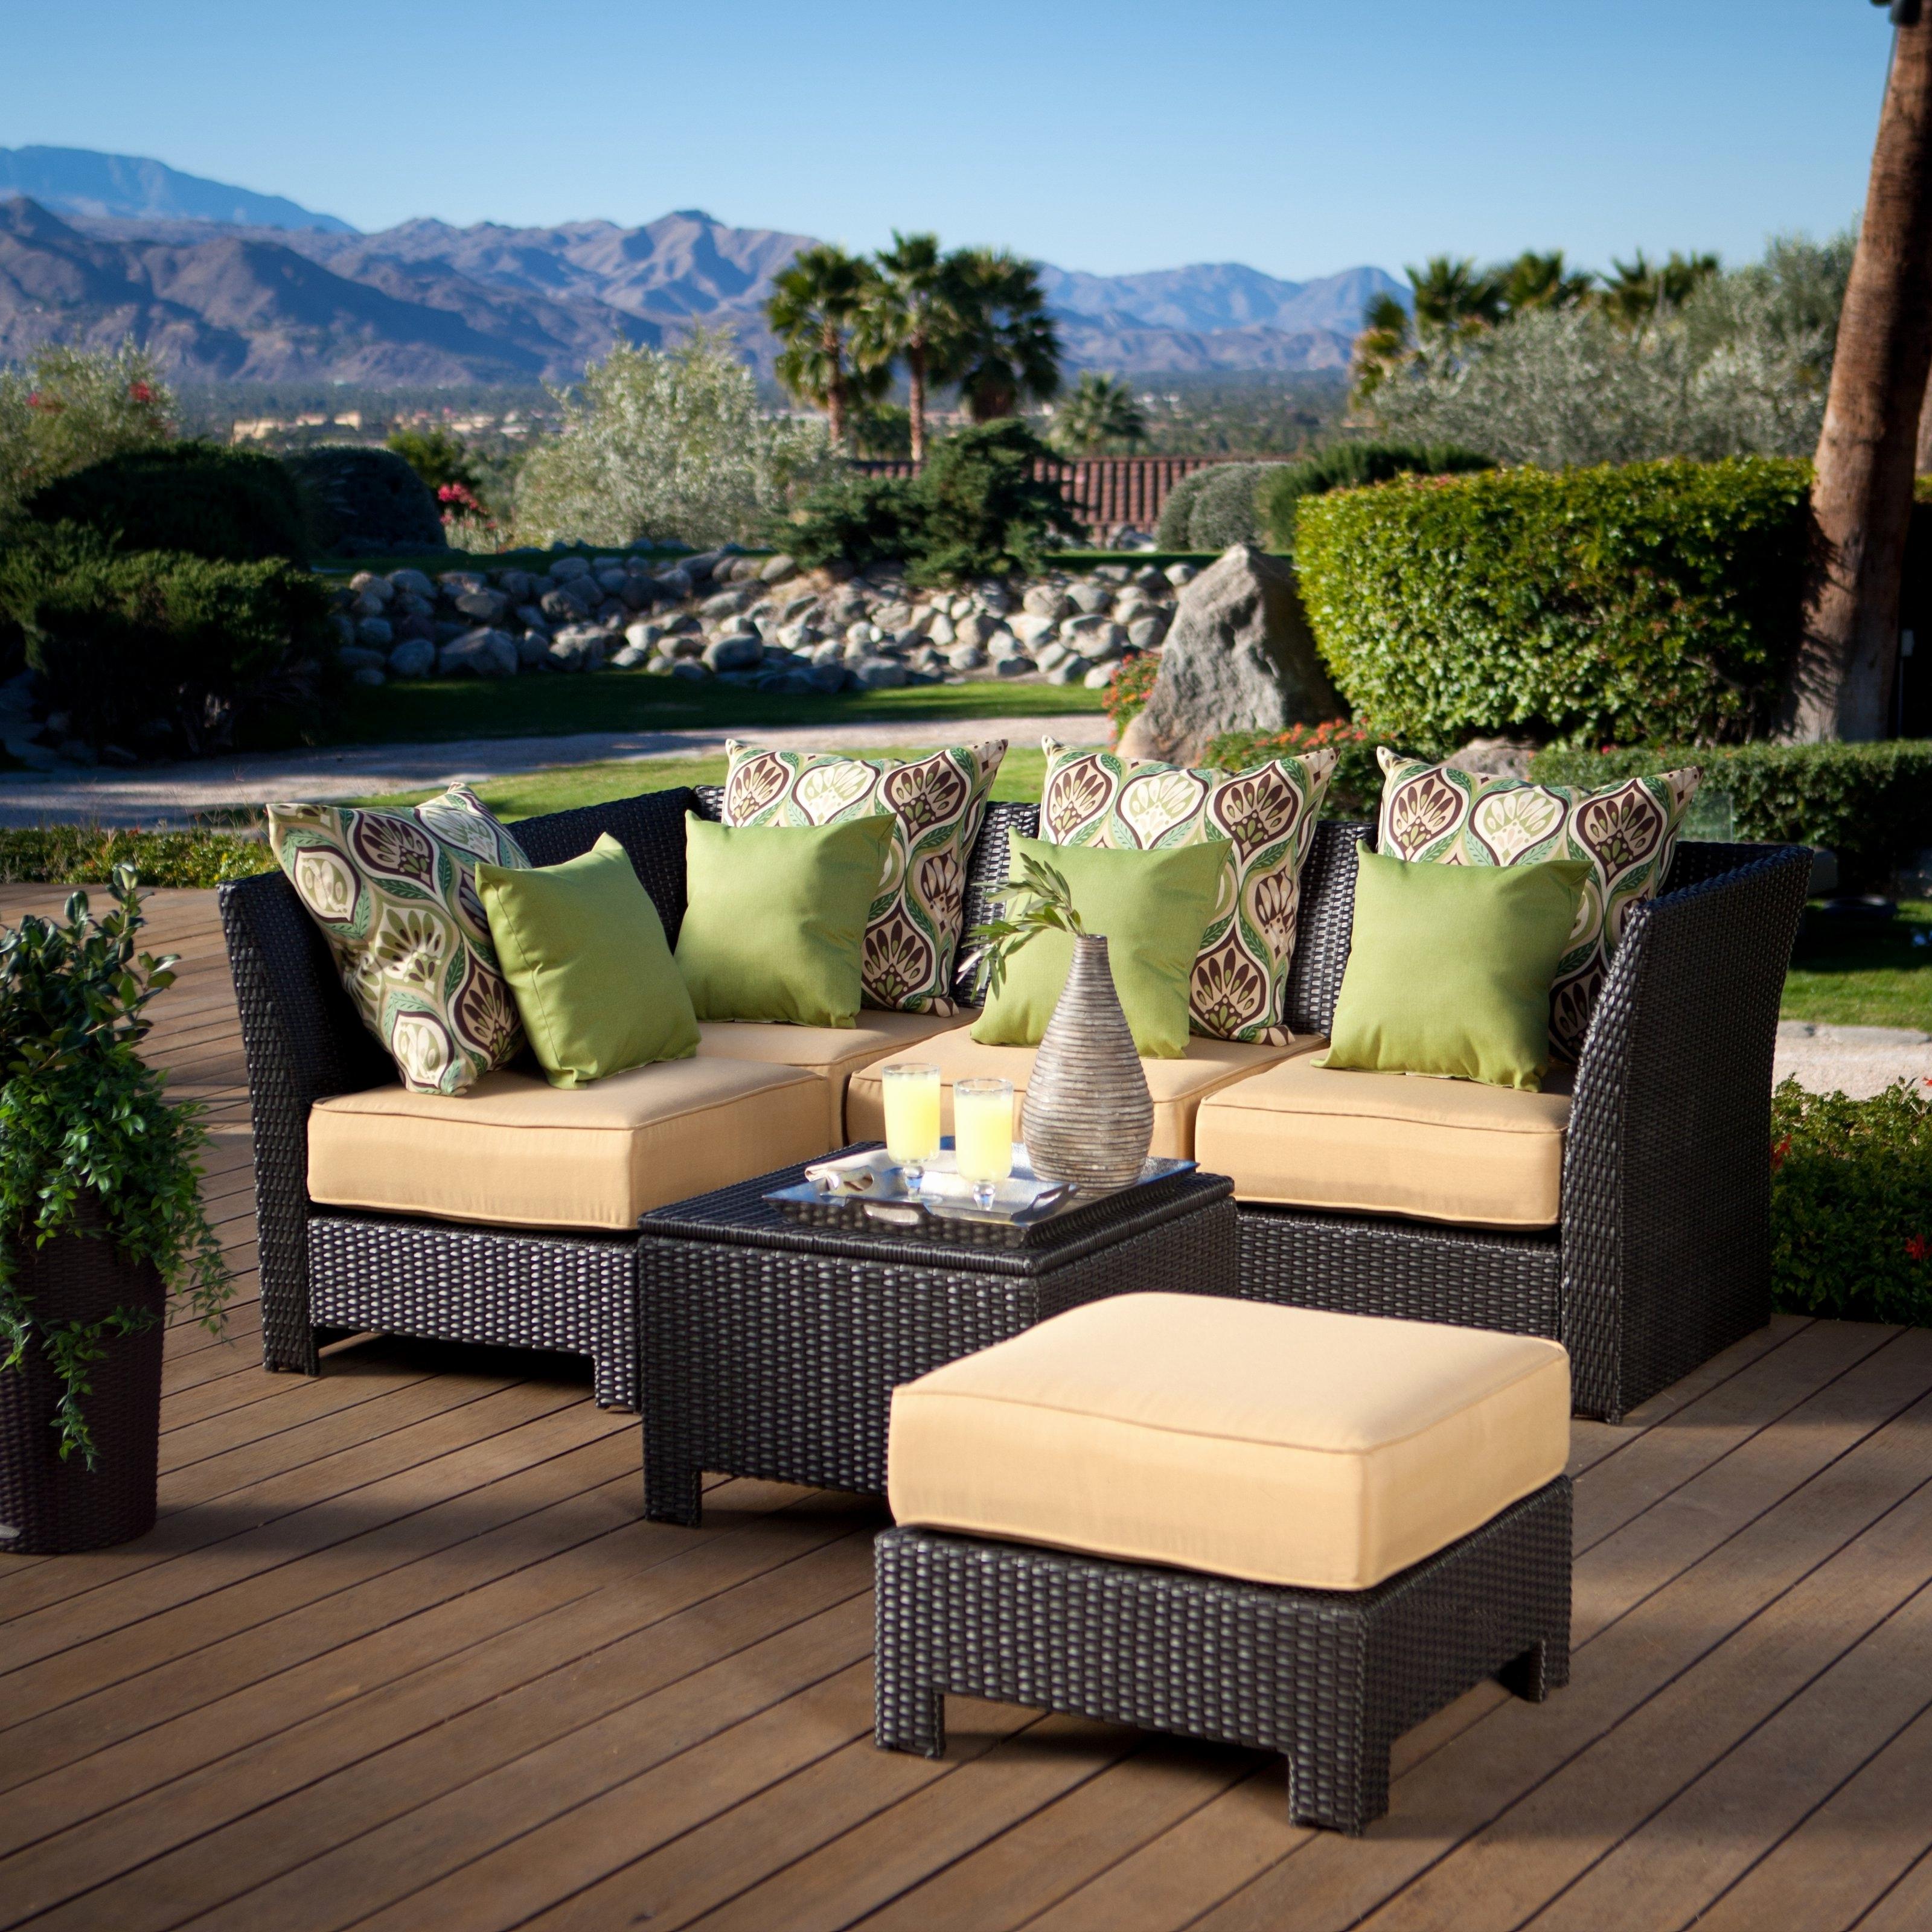 2019 Small Conversation Patio Furniture – Furniture Ideas In Patio Conversation Sets For Small Spaces (View 1 of 20)